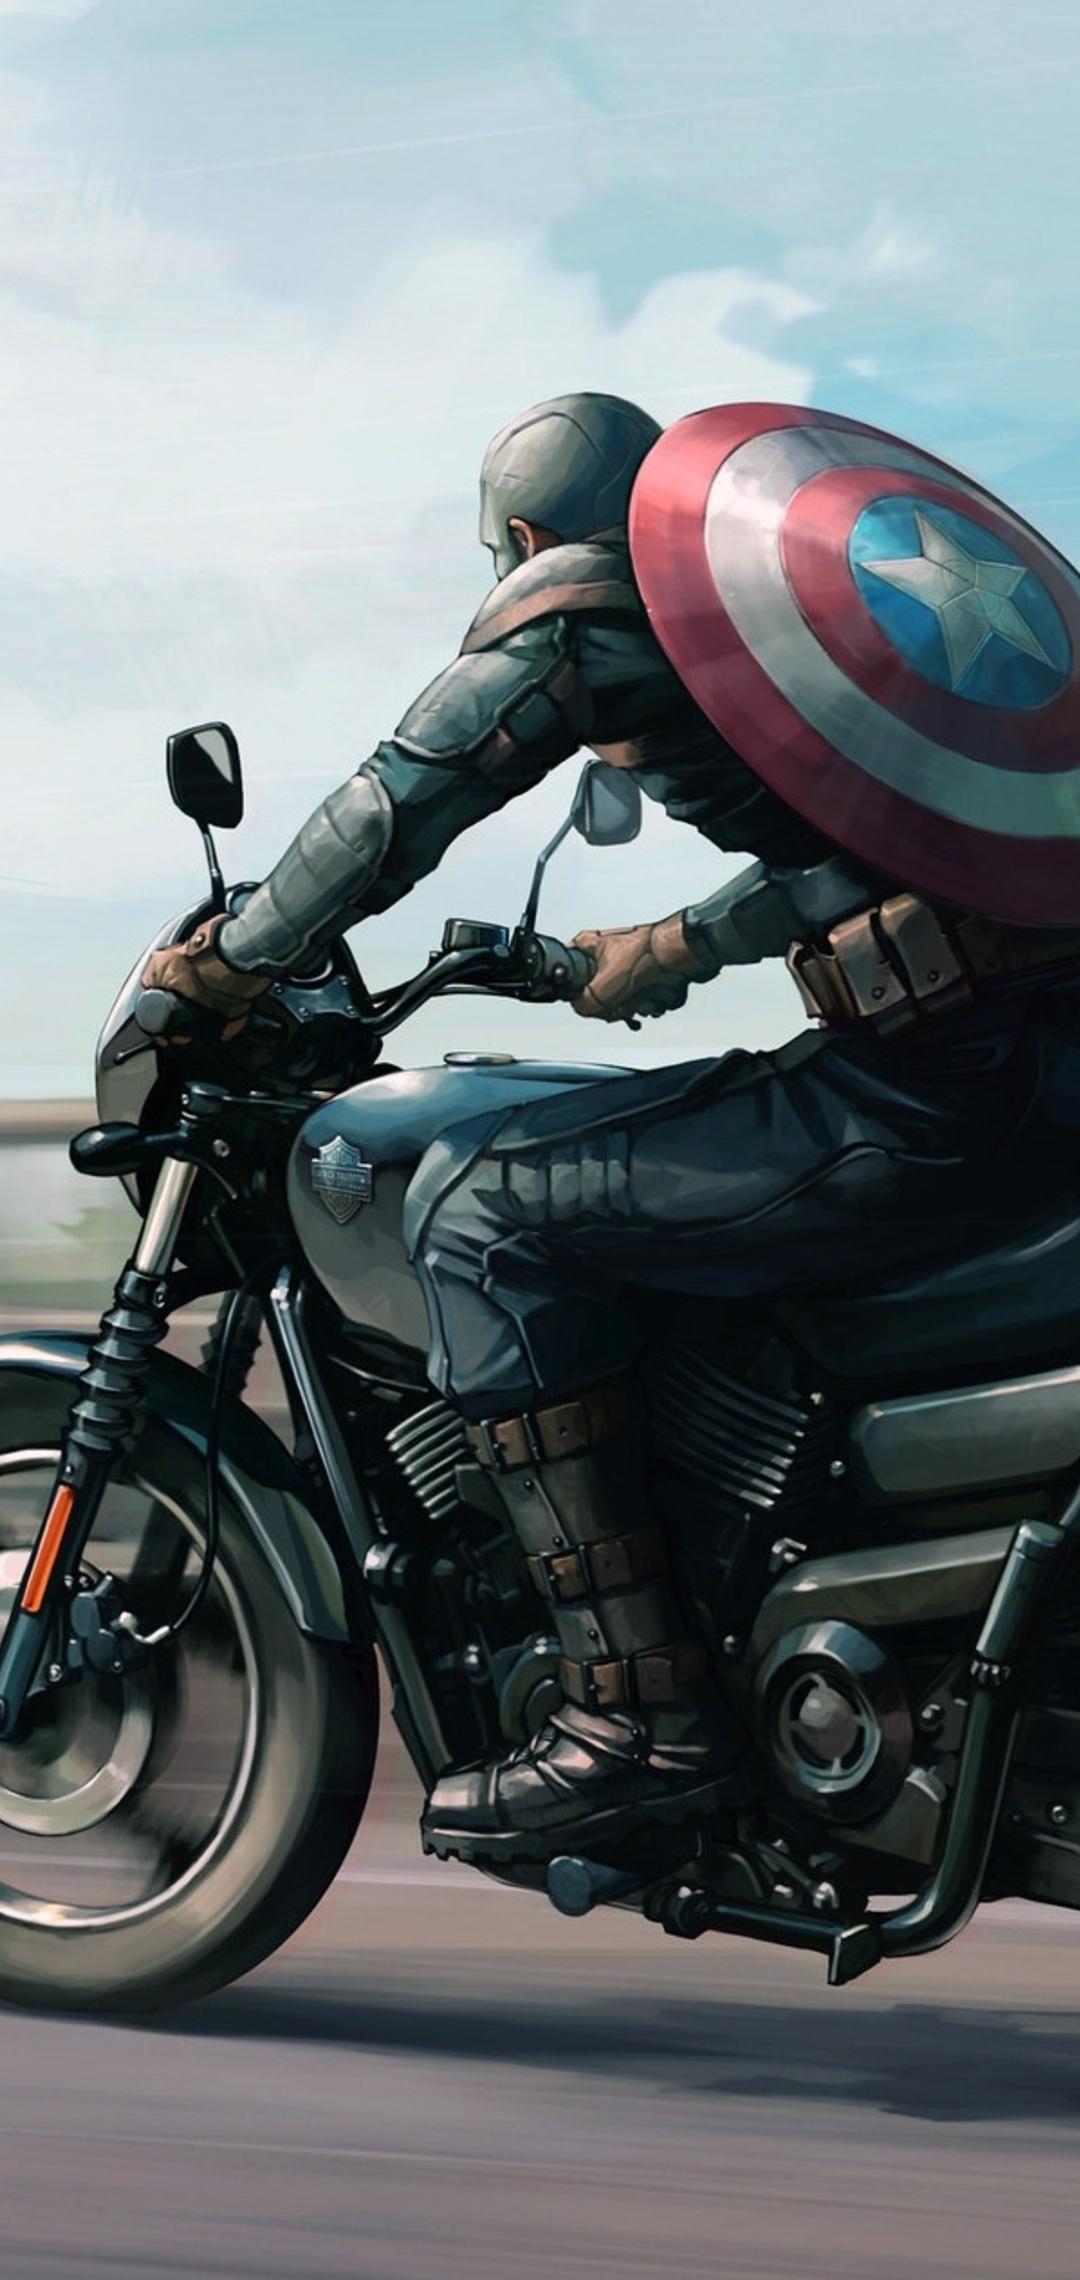 captain-america-on-harley-davidson-motorcycle-artwork-qj.jpg